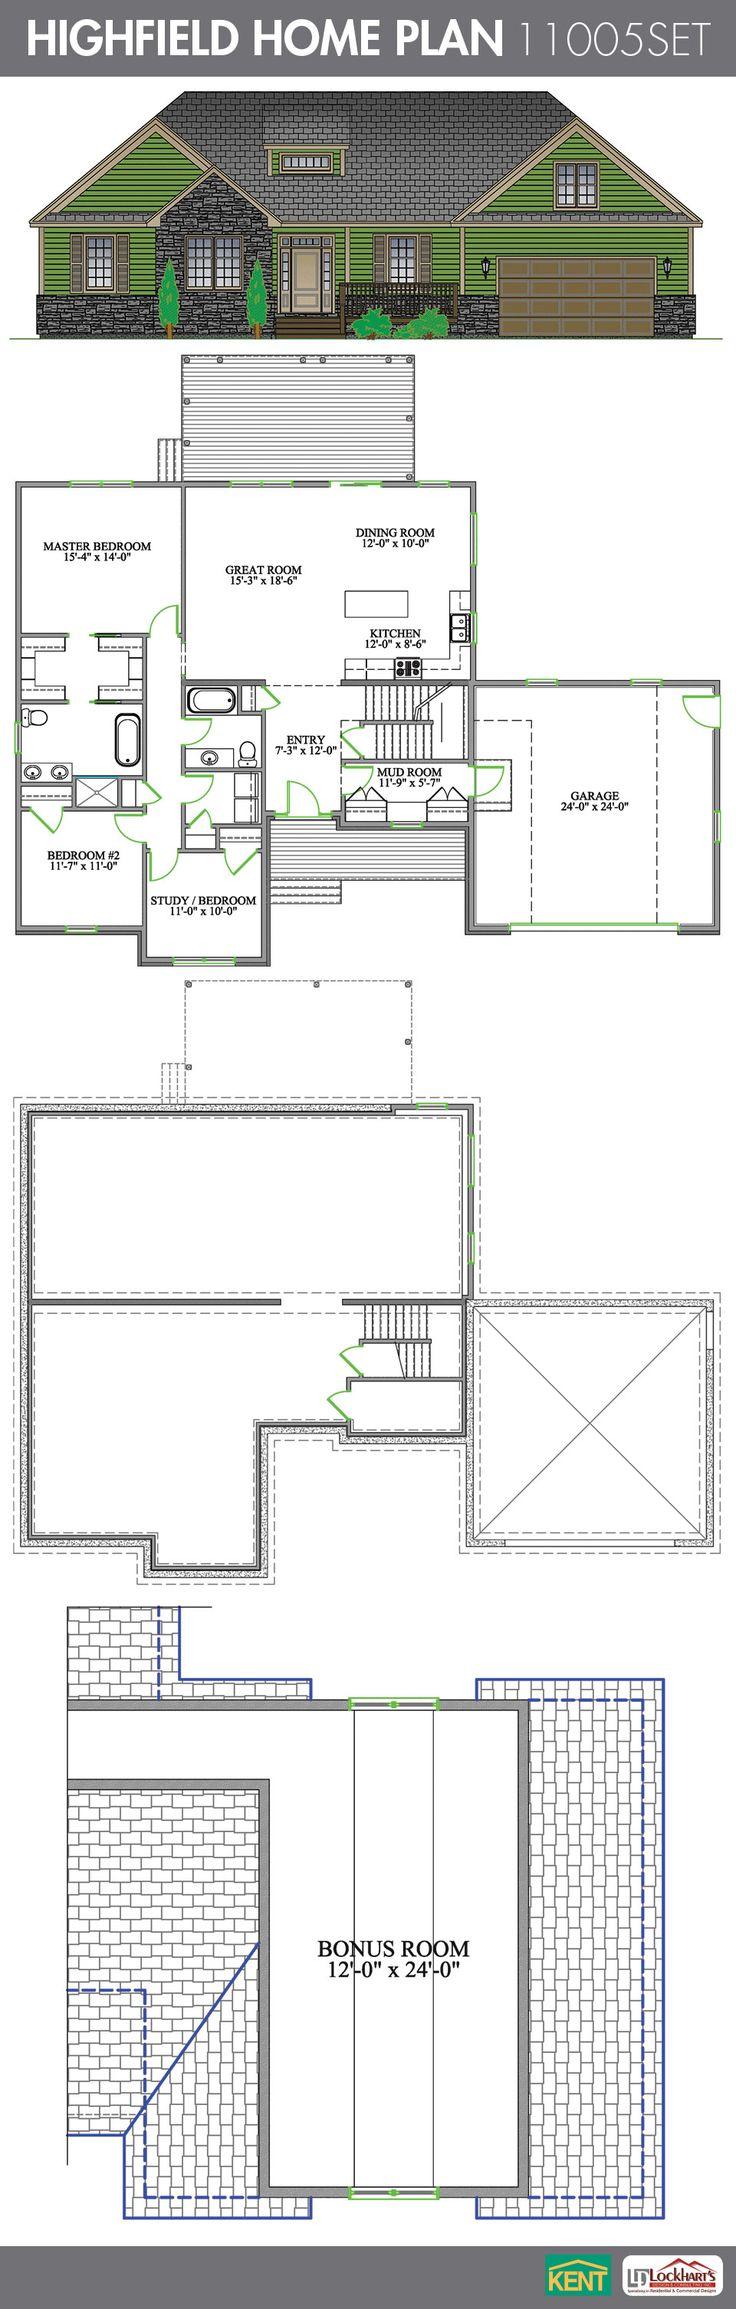 Highfield 3 Bedroom, 2 Bath Home Plan. Features: Open Concept Great Room/